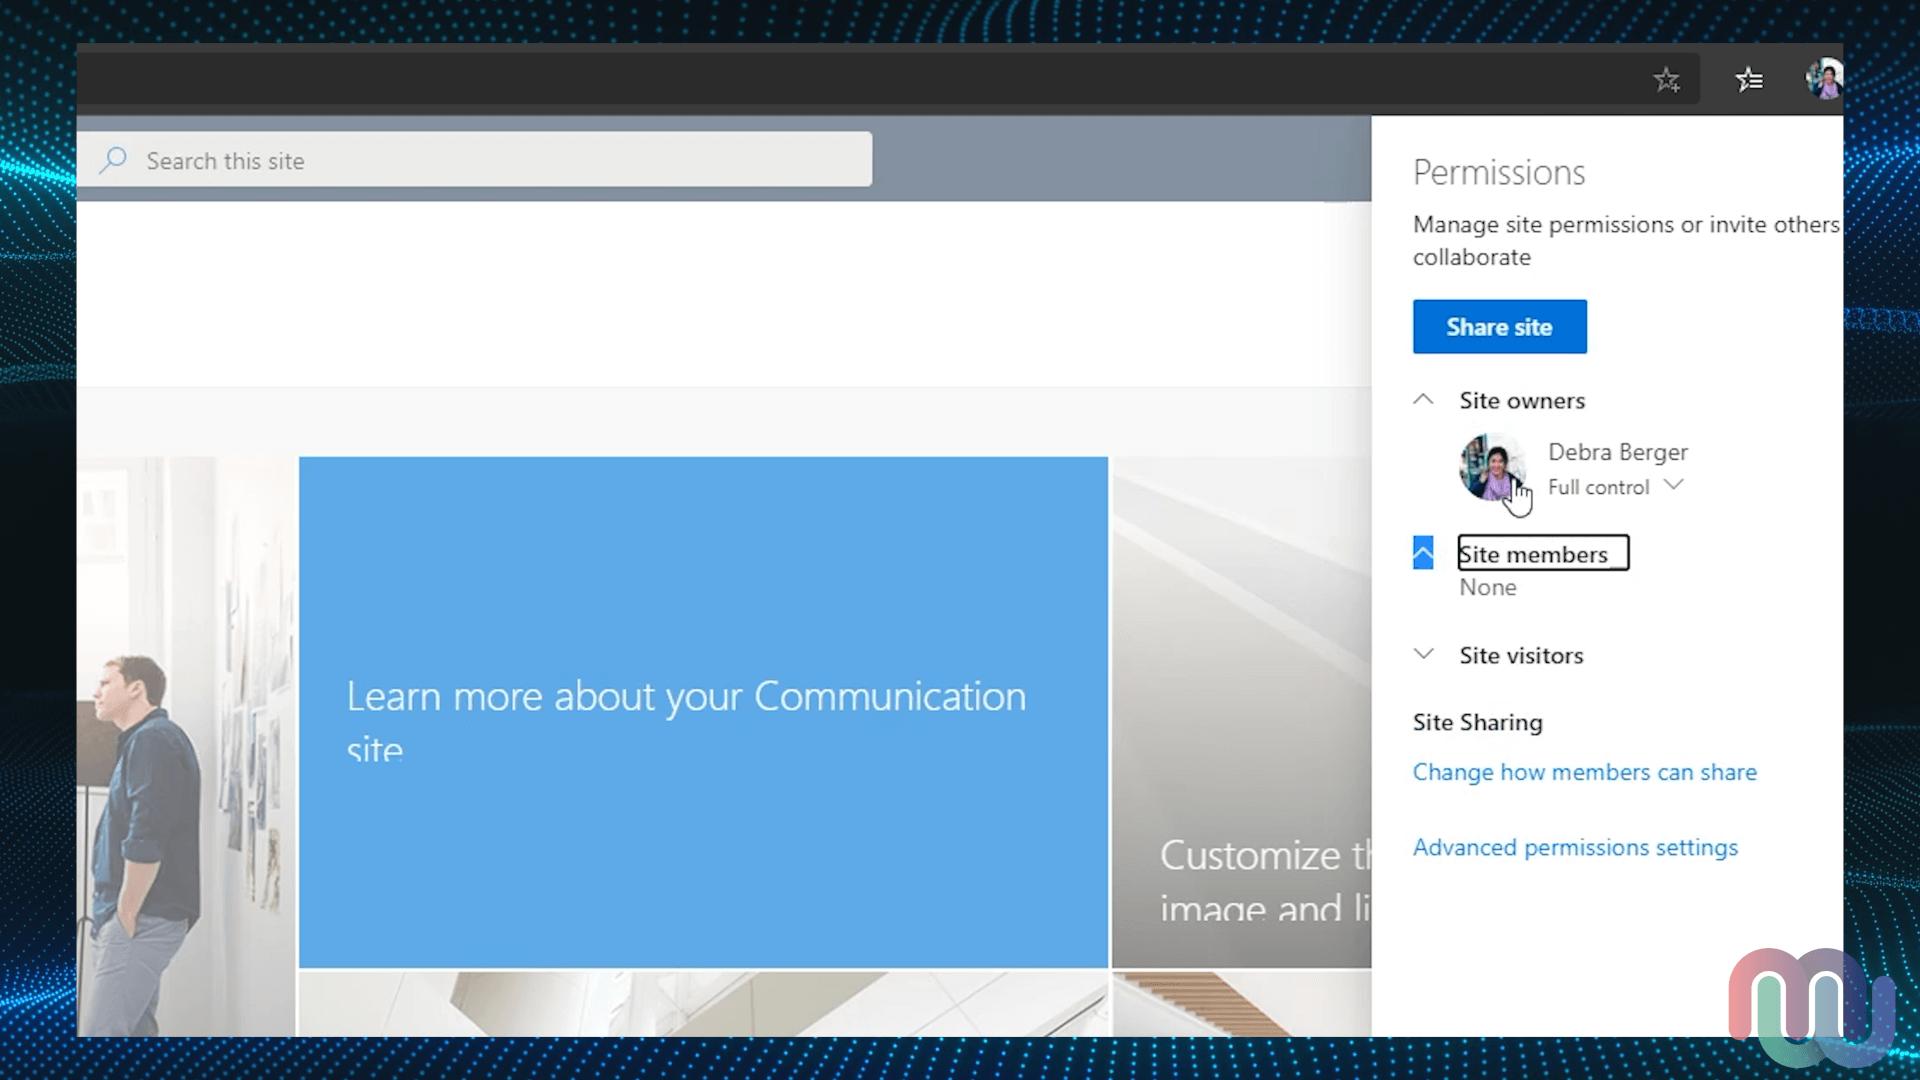 SharePoint Permissions menu